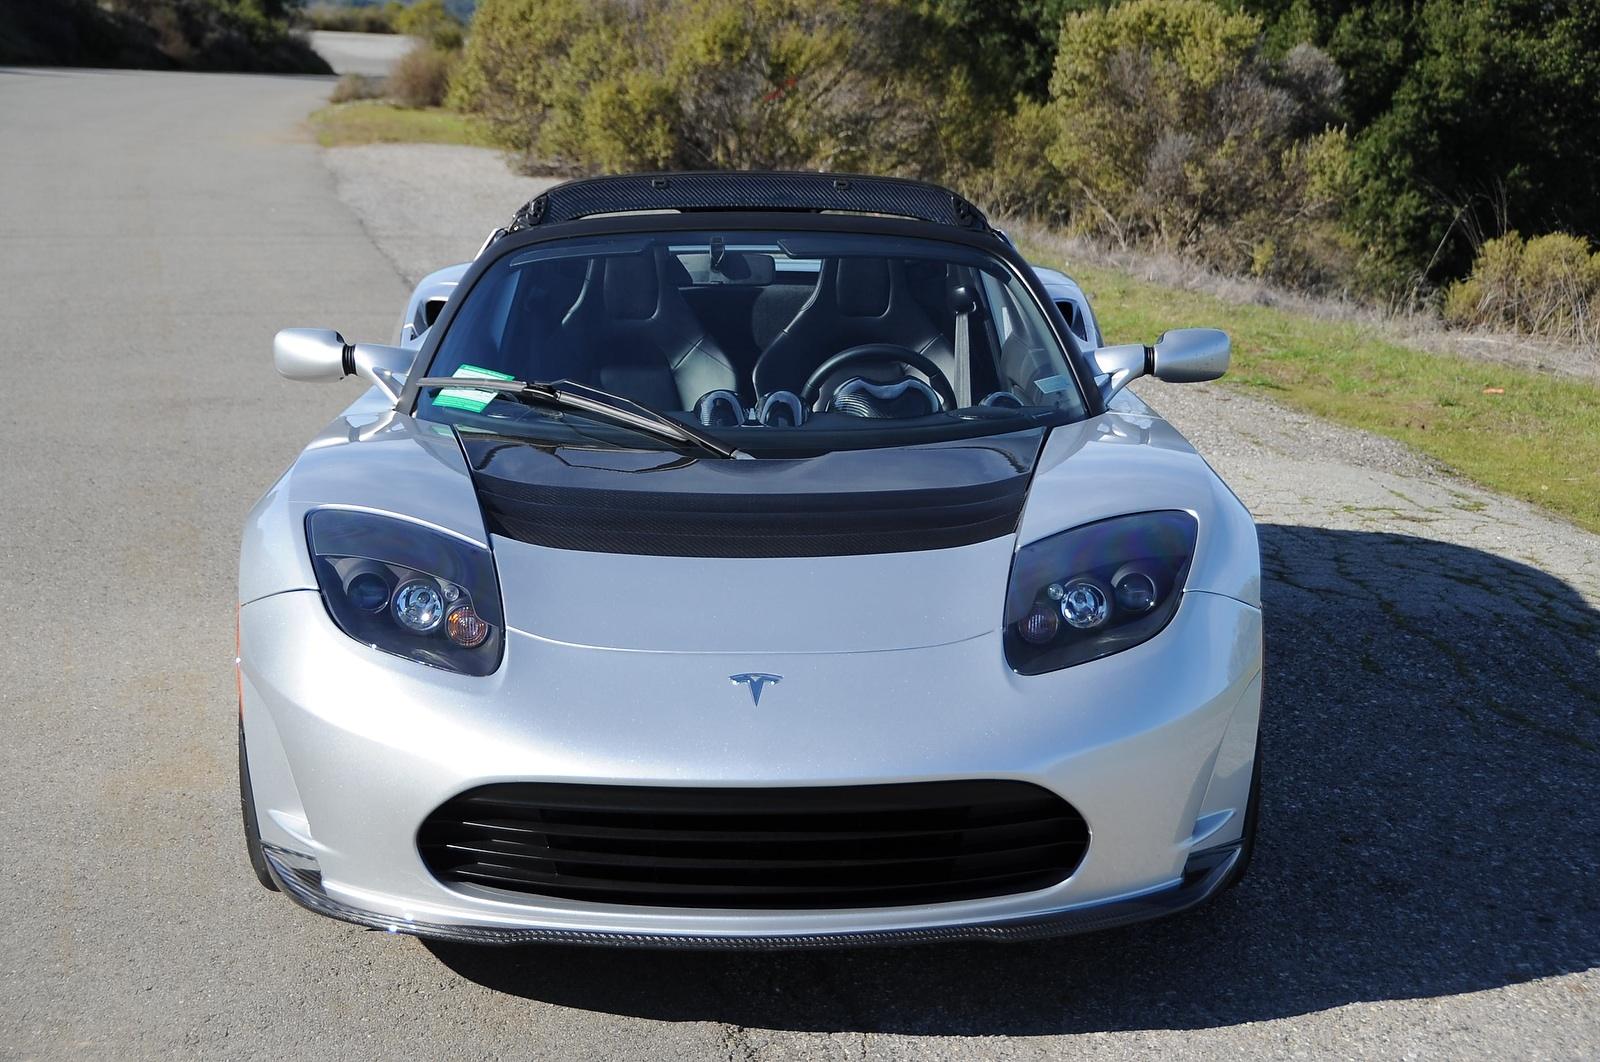 all new camry logo spesifikasi grand avanza tipe e 2016 bricking a tesla roadster battery: today's electric car meme